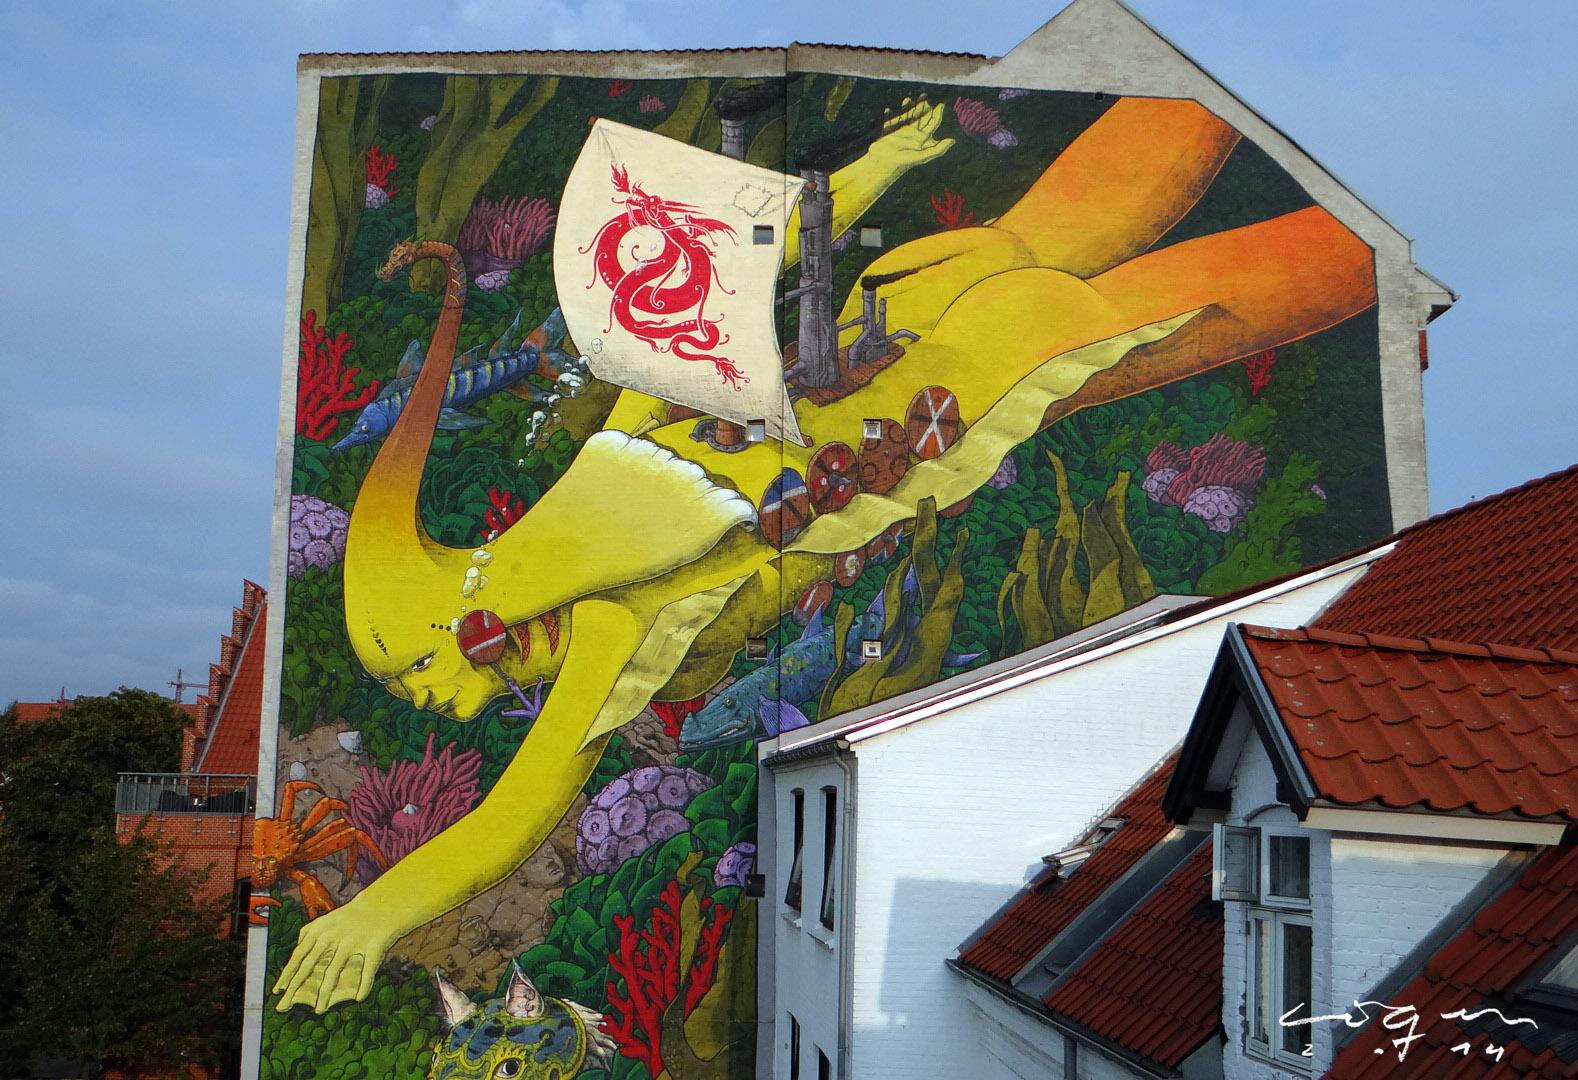 liqen-new-mural-in-aalborg-denmark-01